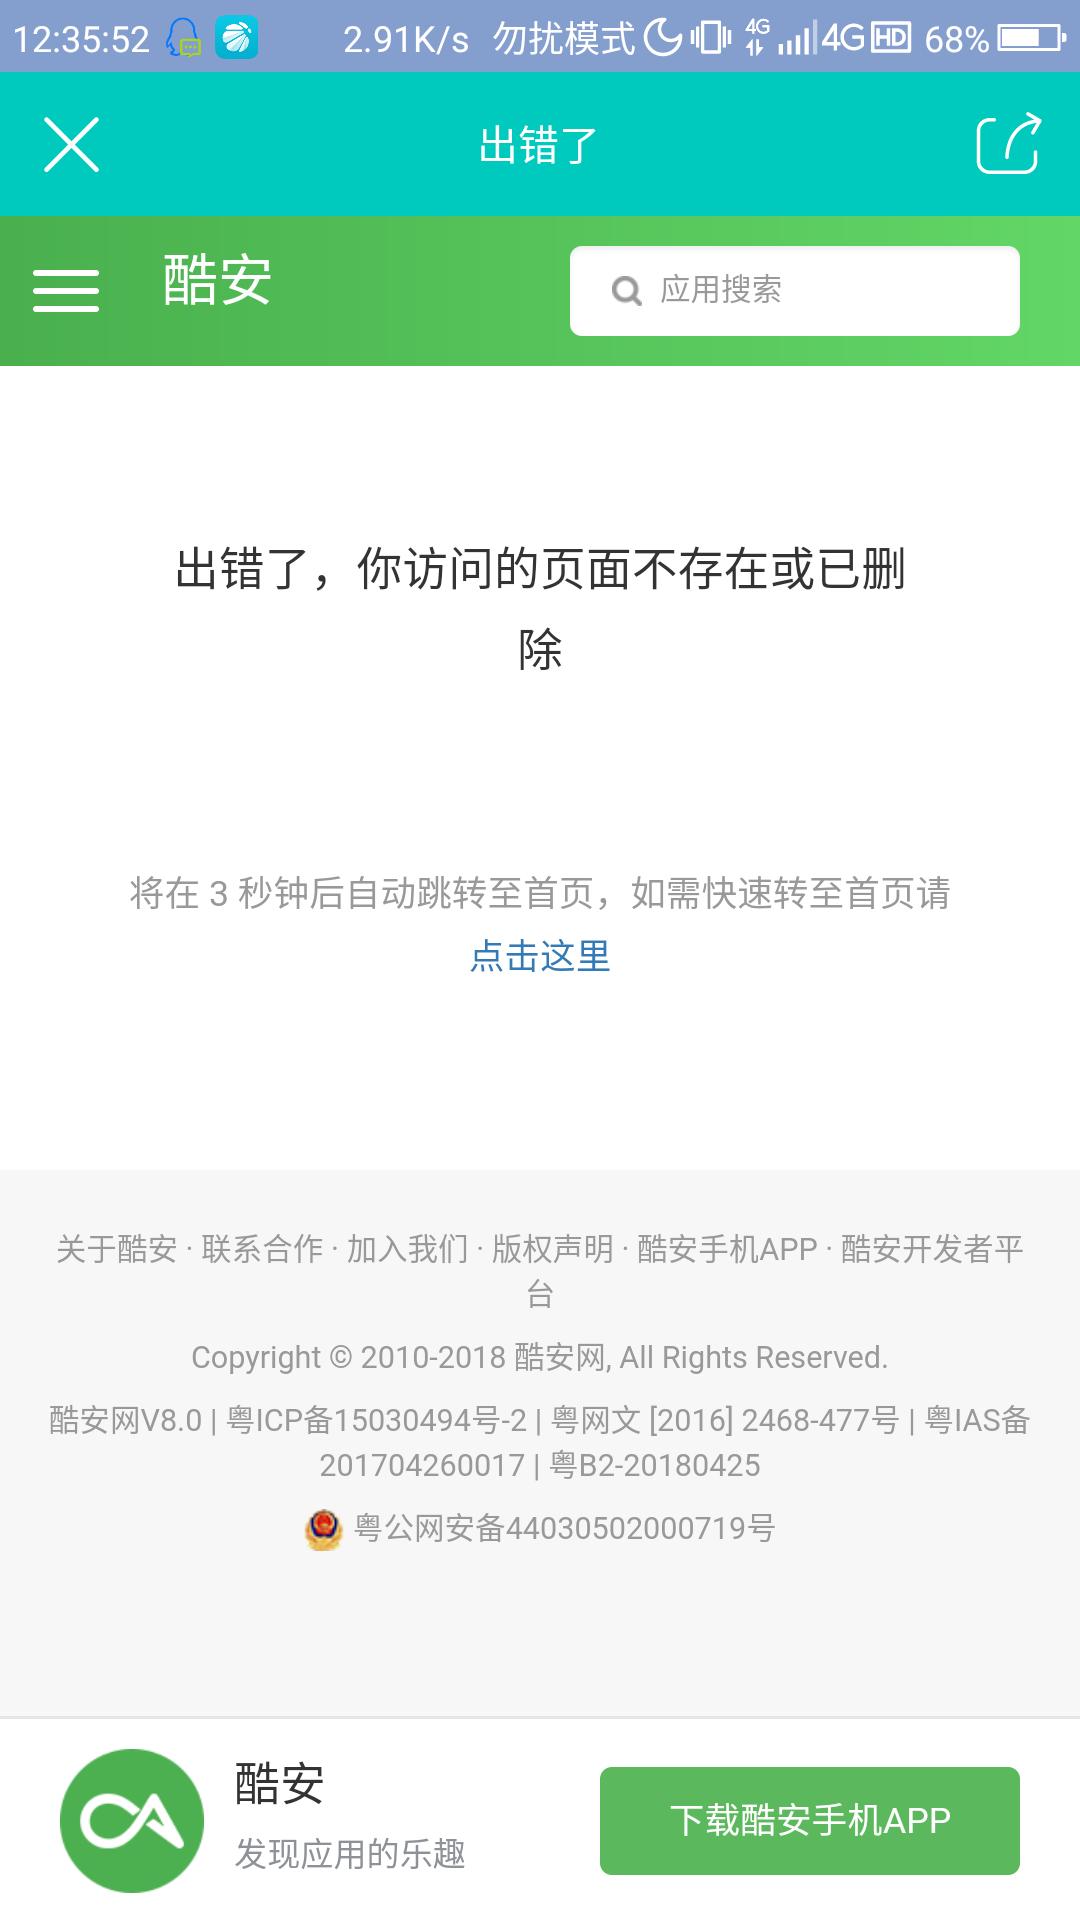 Screenshot_2018-09-03-12-35-54.png